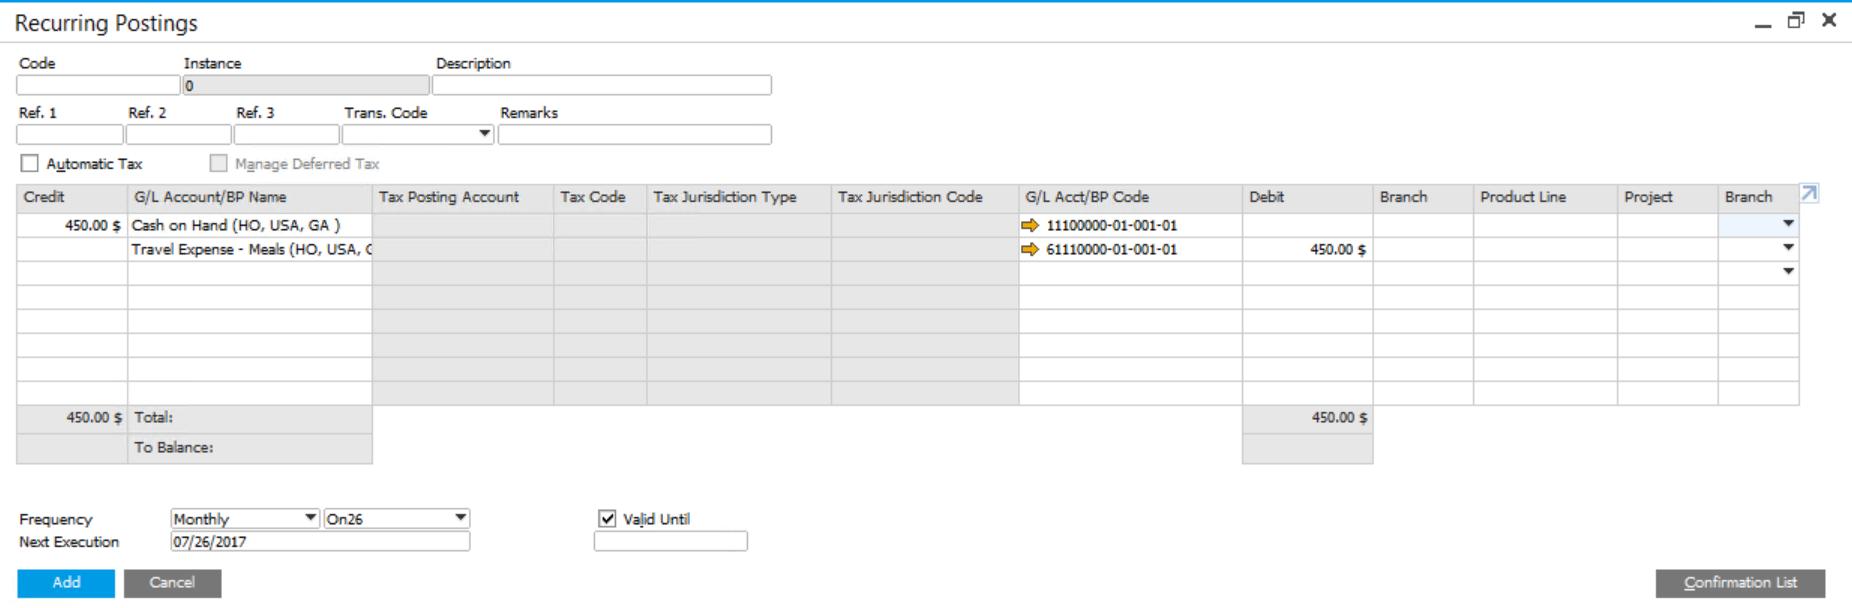 Recurring-Postings-in-SAP-Business-One-1